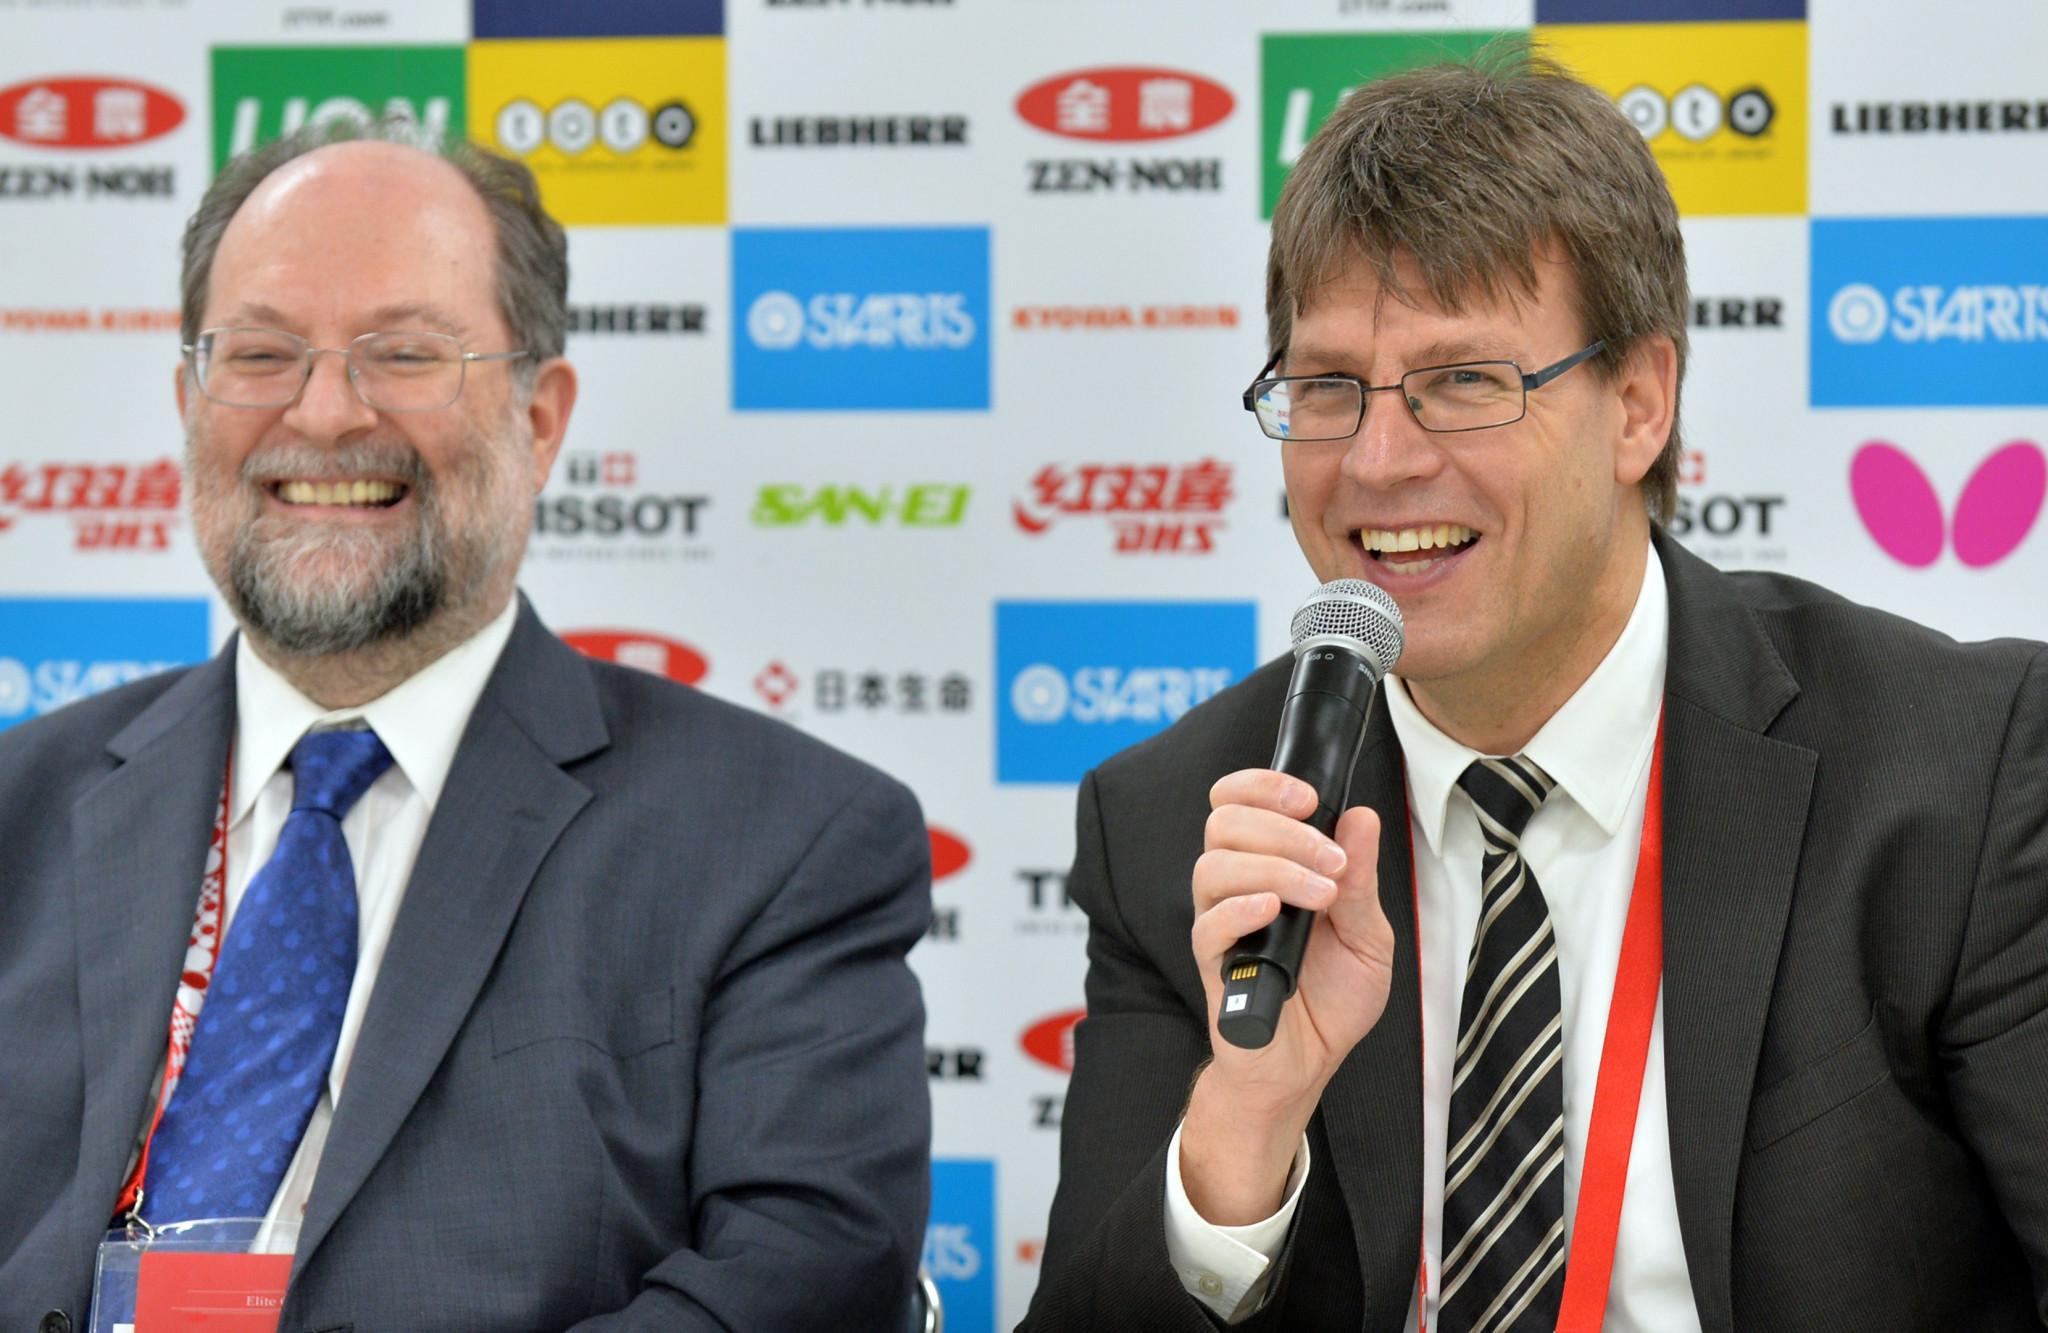 Solesbury Gay claimed ITTF President Thomas Weikert made three